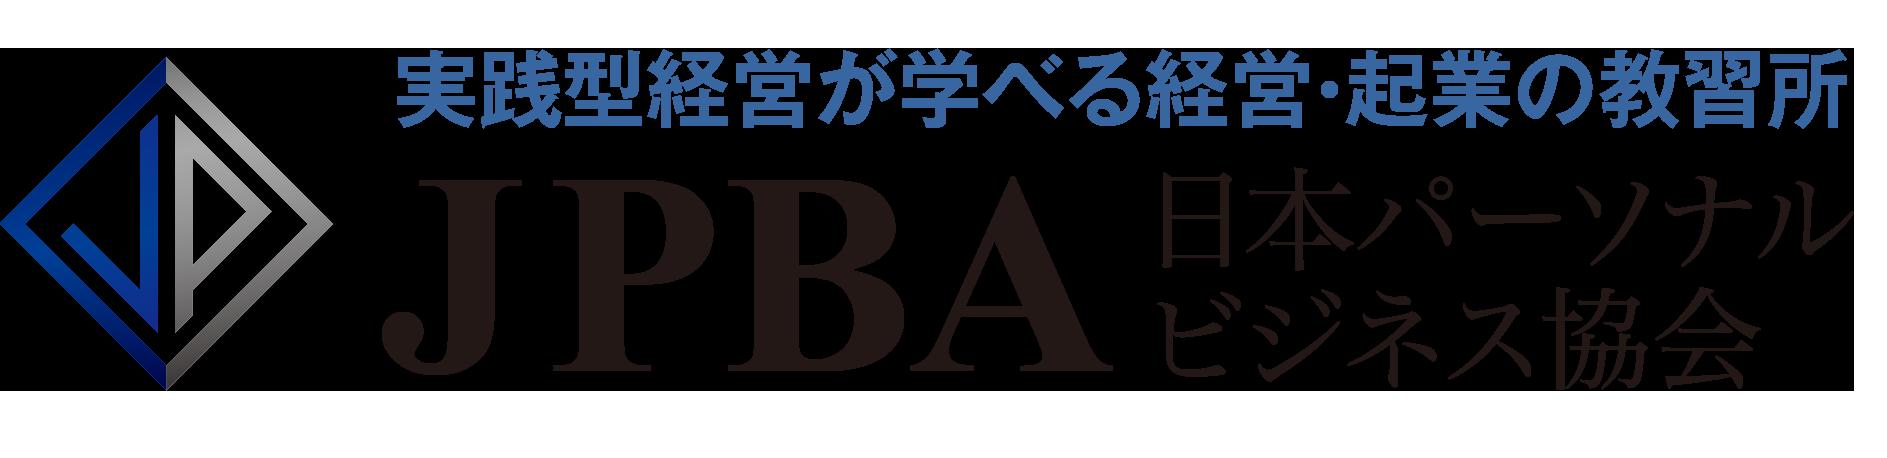 JPBA 一般社団法人日本パーソナルビジネス協会 「経営力教育」で豊かな社会を共に創る